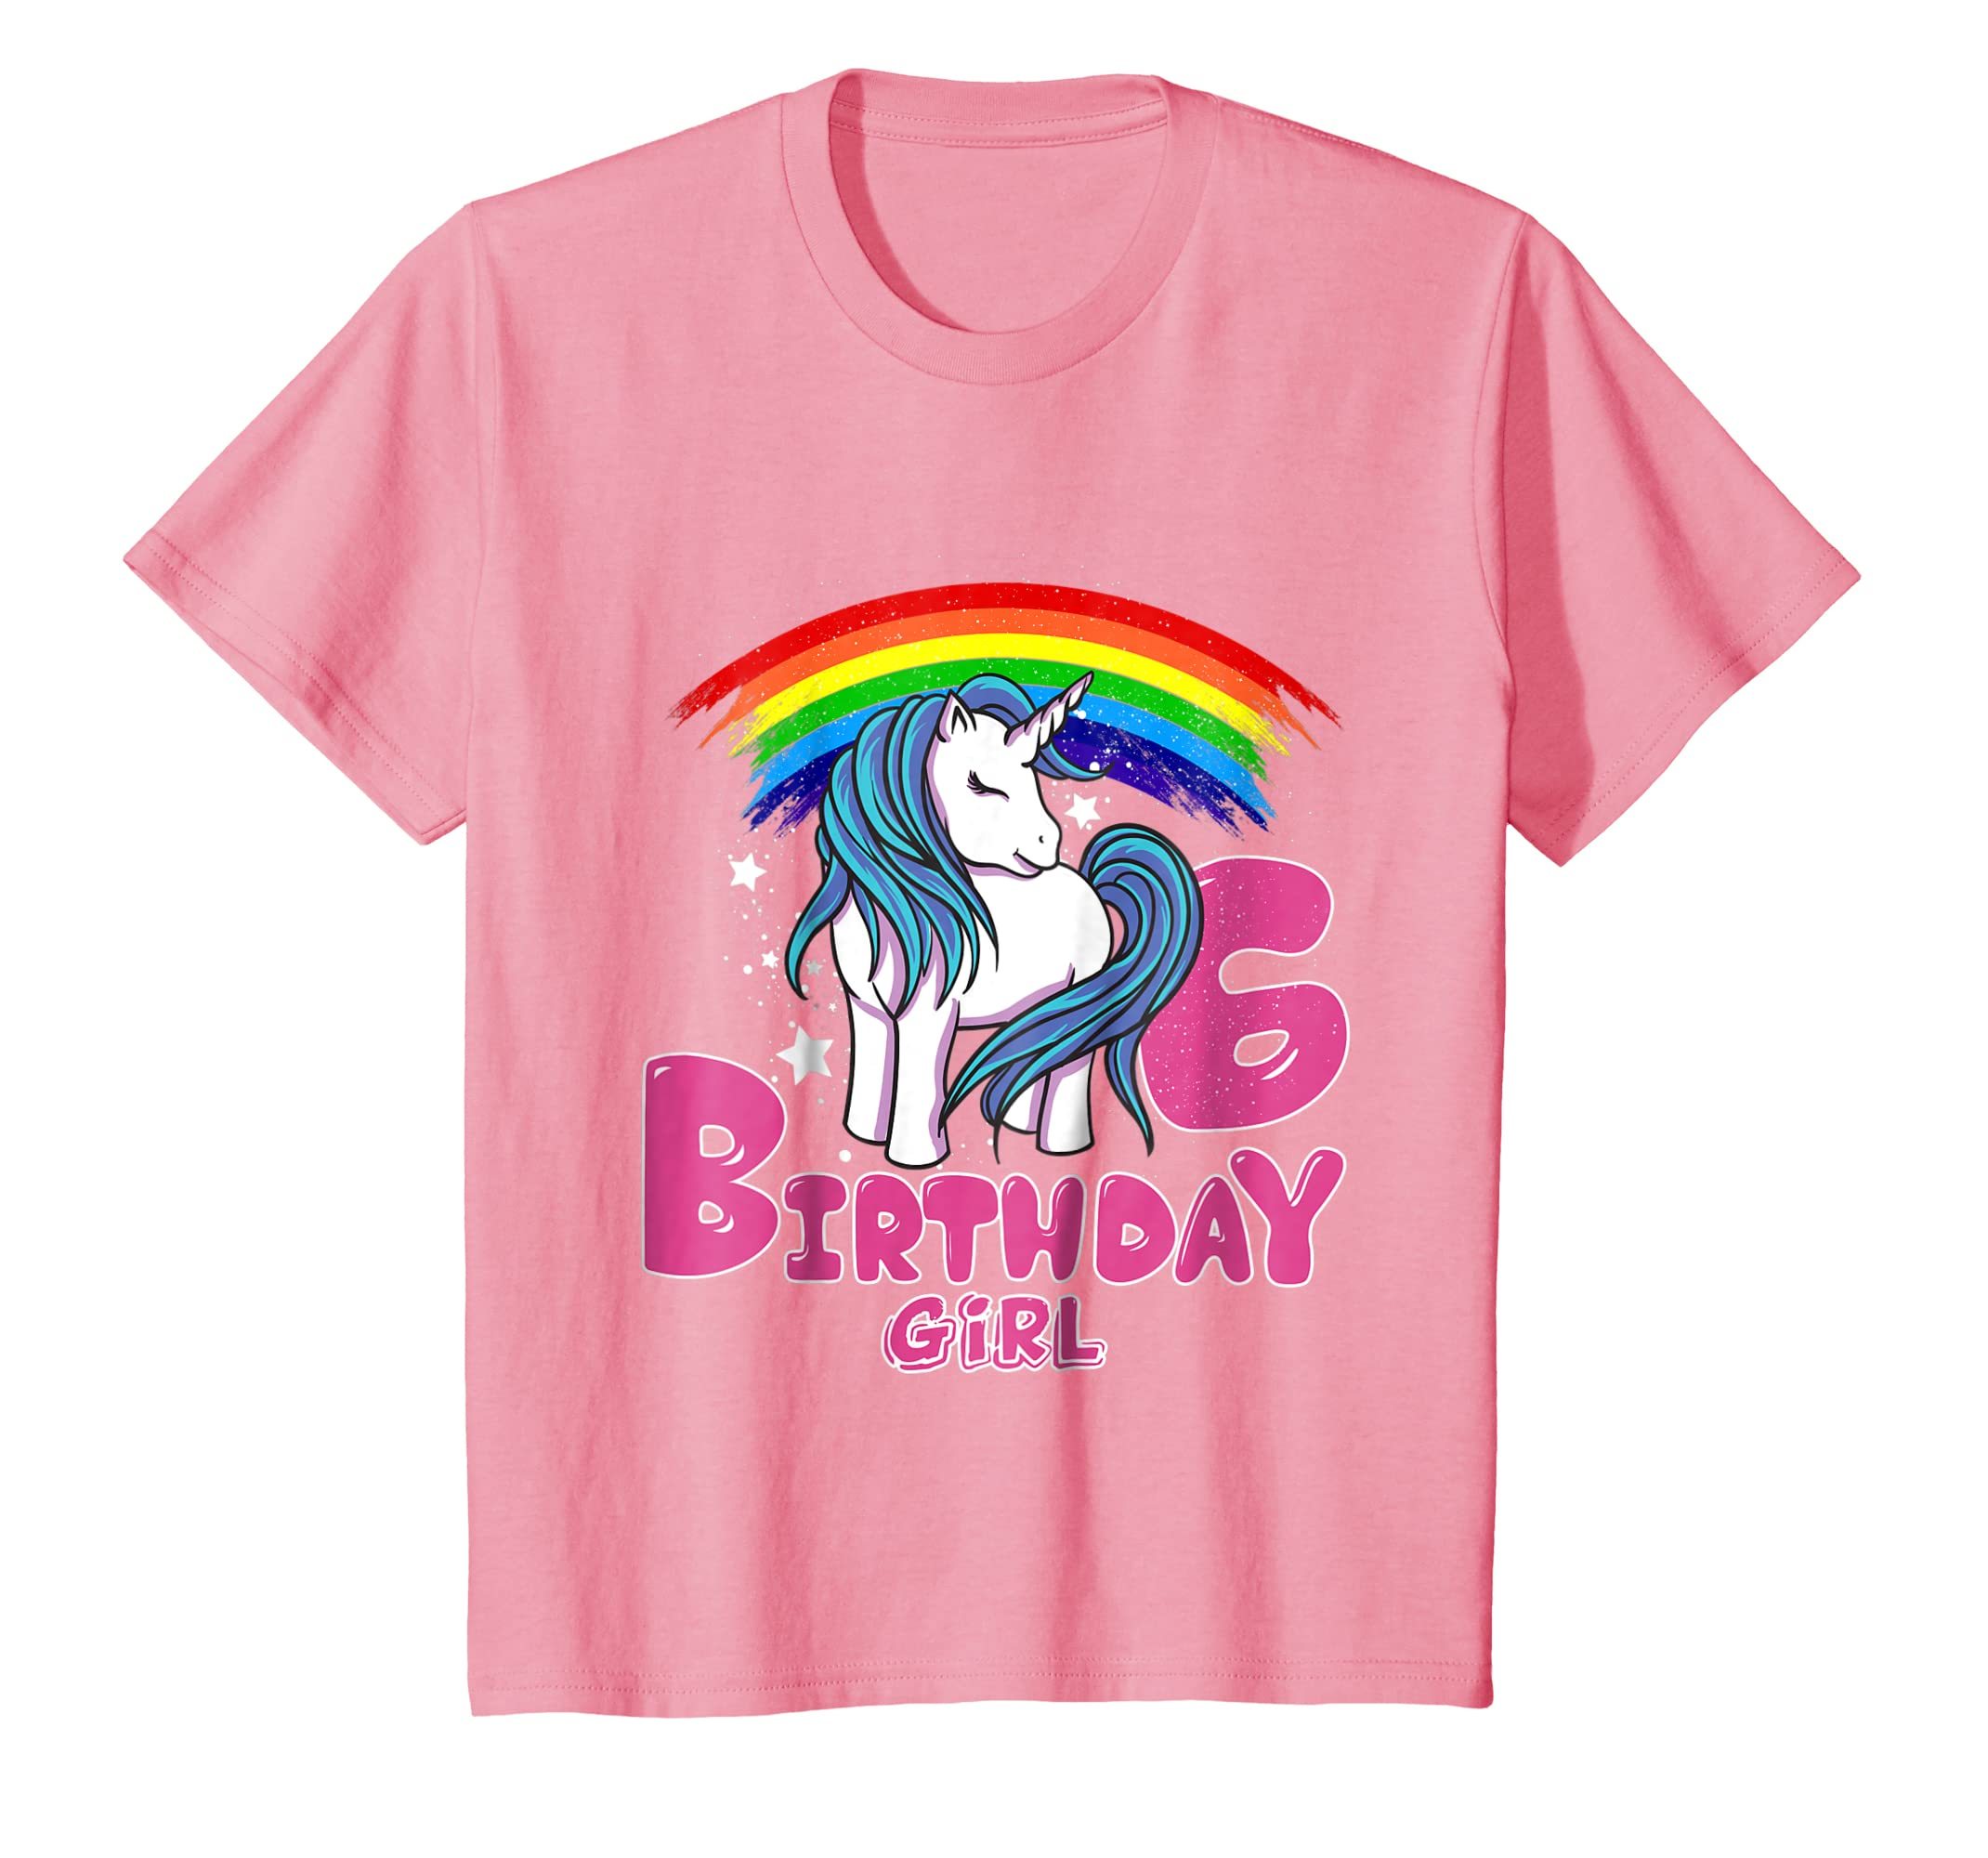 Amazon Kids Unicorn Birthday 6th Girl Party Gift Kid T Shirt Clothing